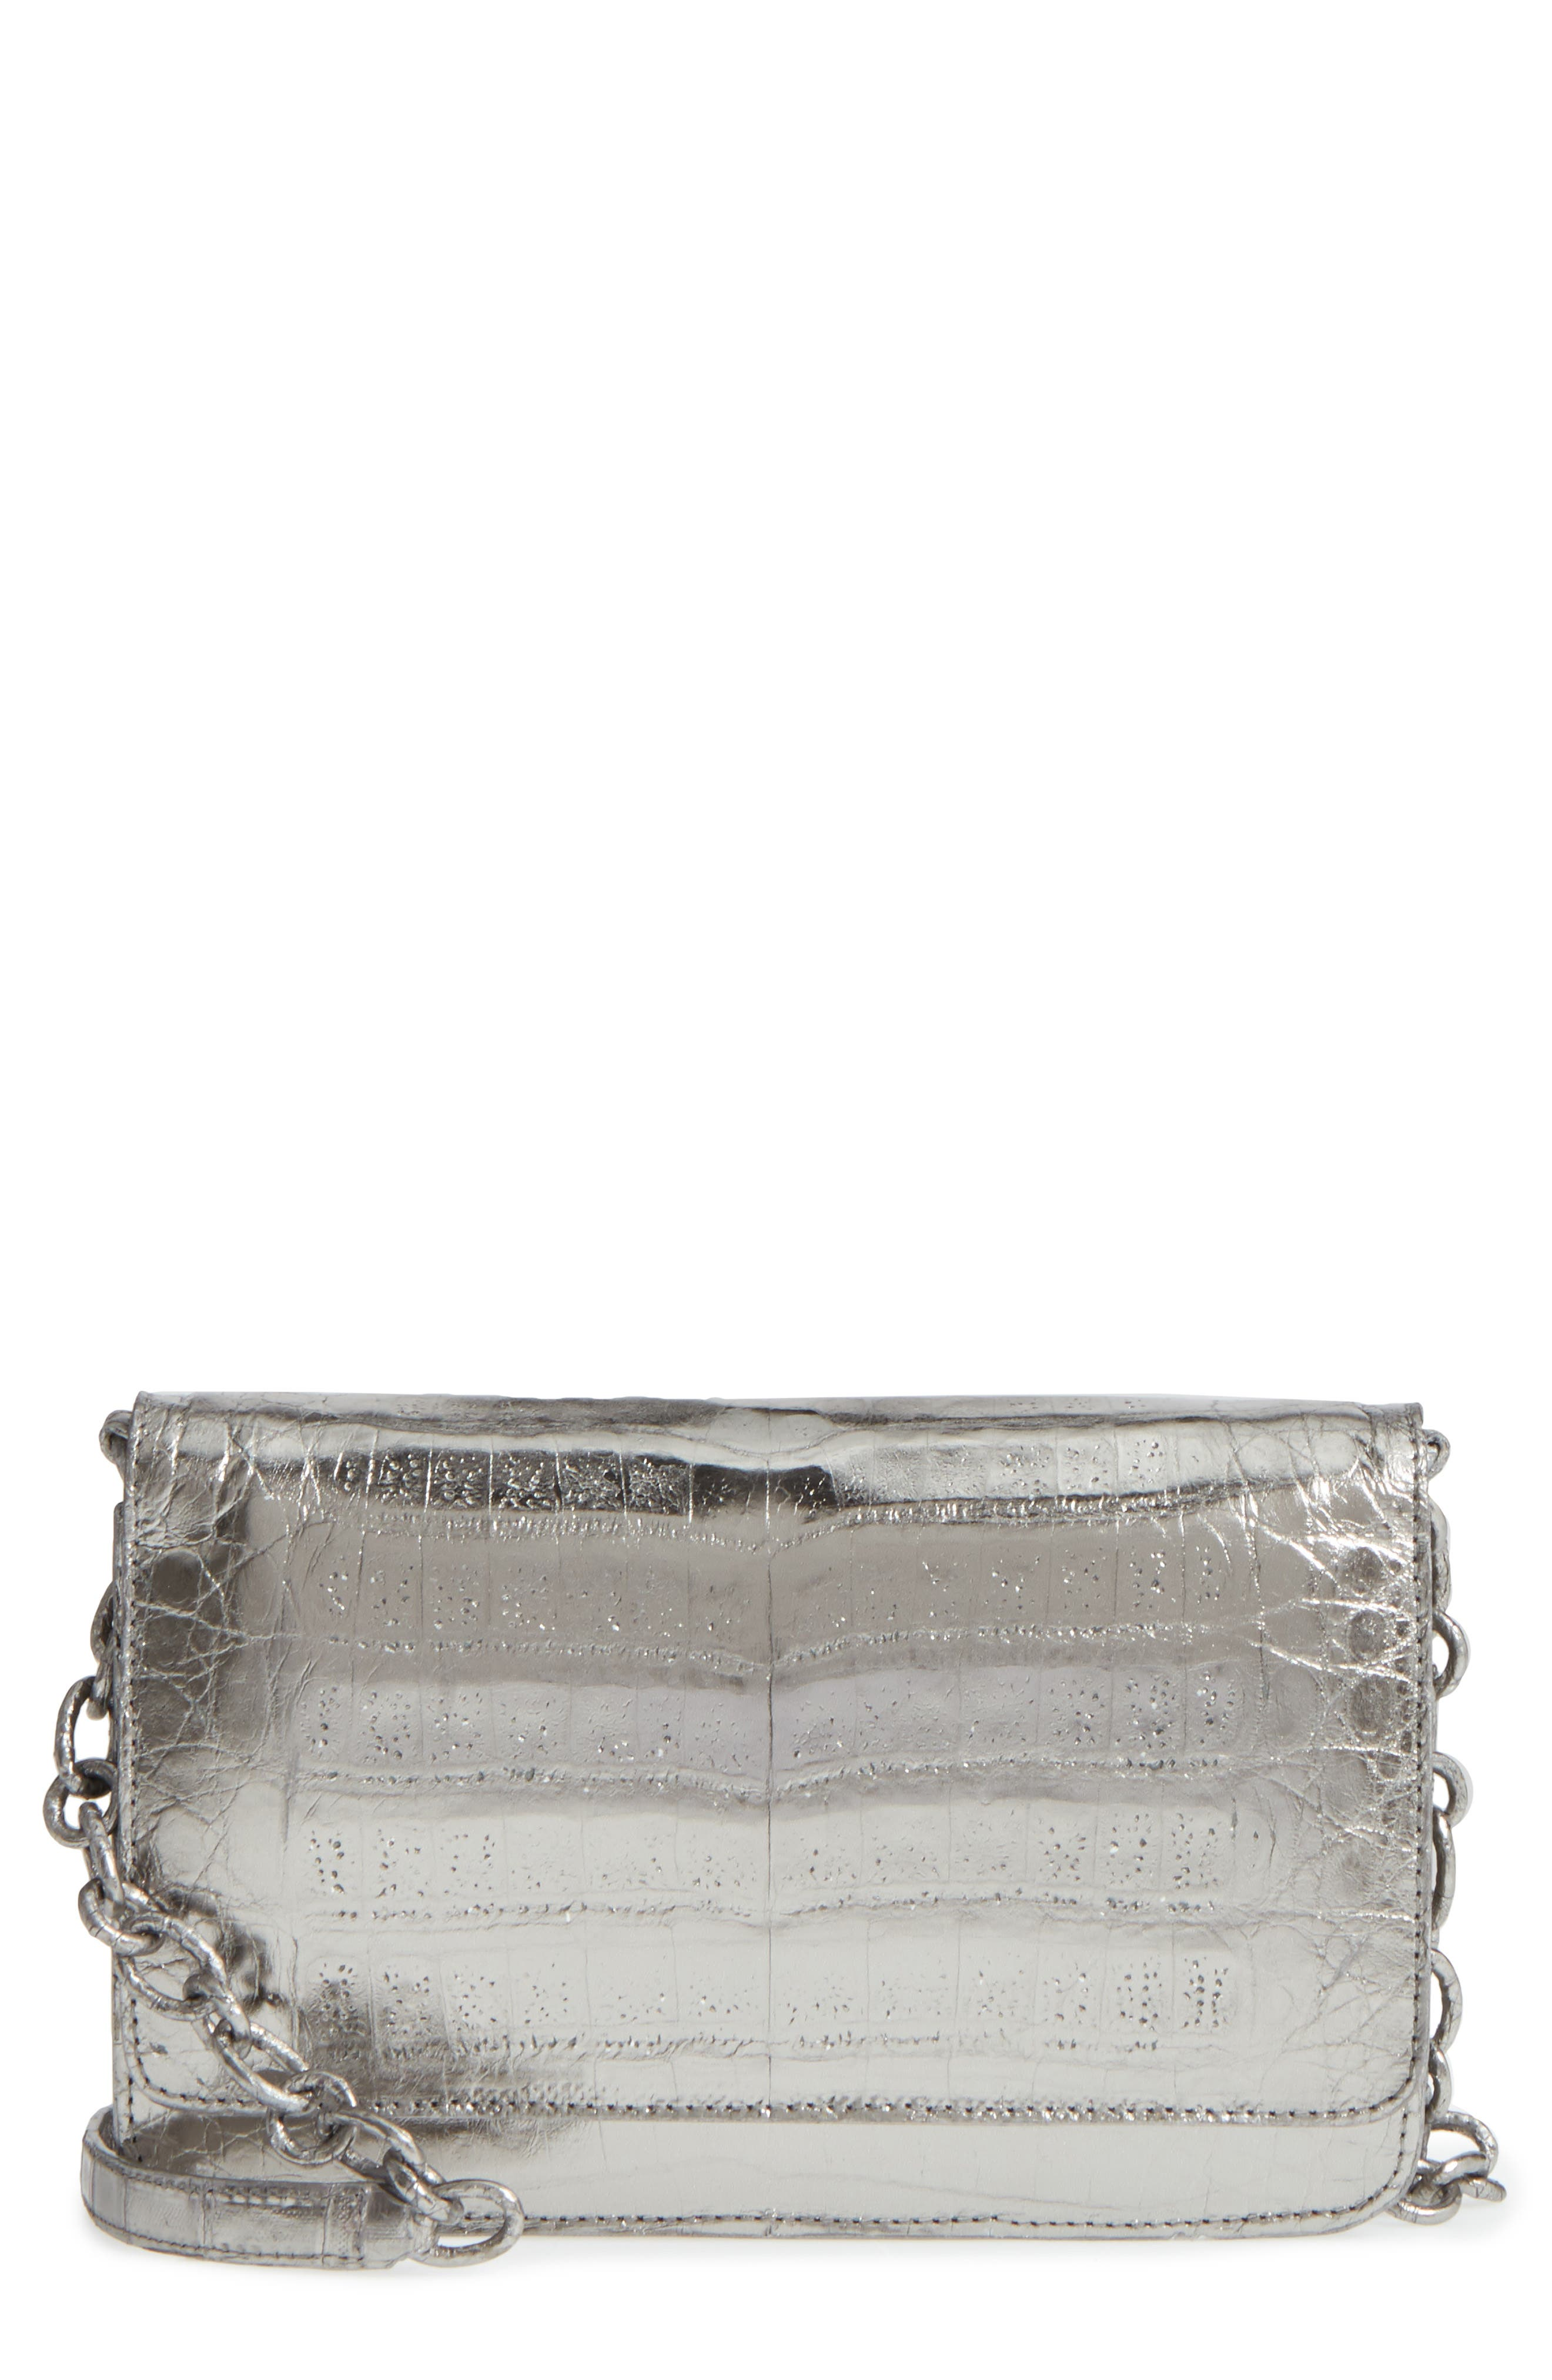 Nancy Gonzalez Genuine Crocodile Metallic Wallet on a Chain